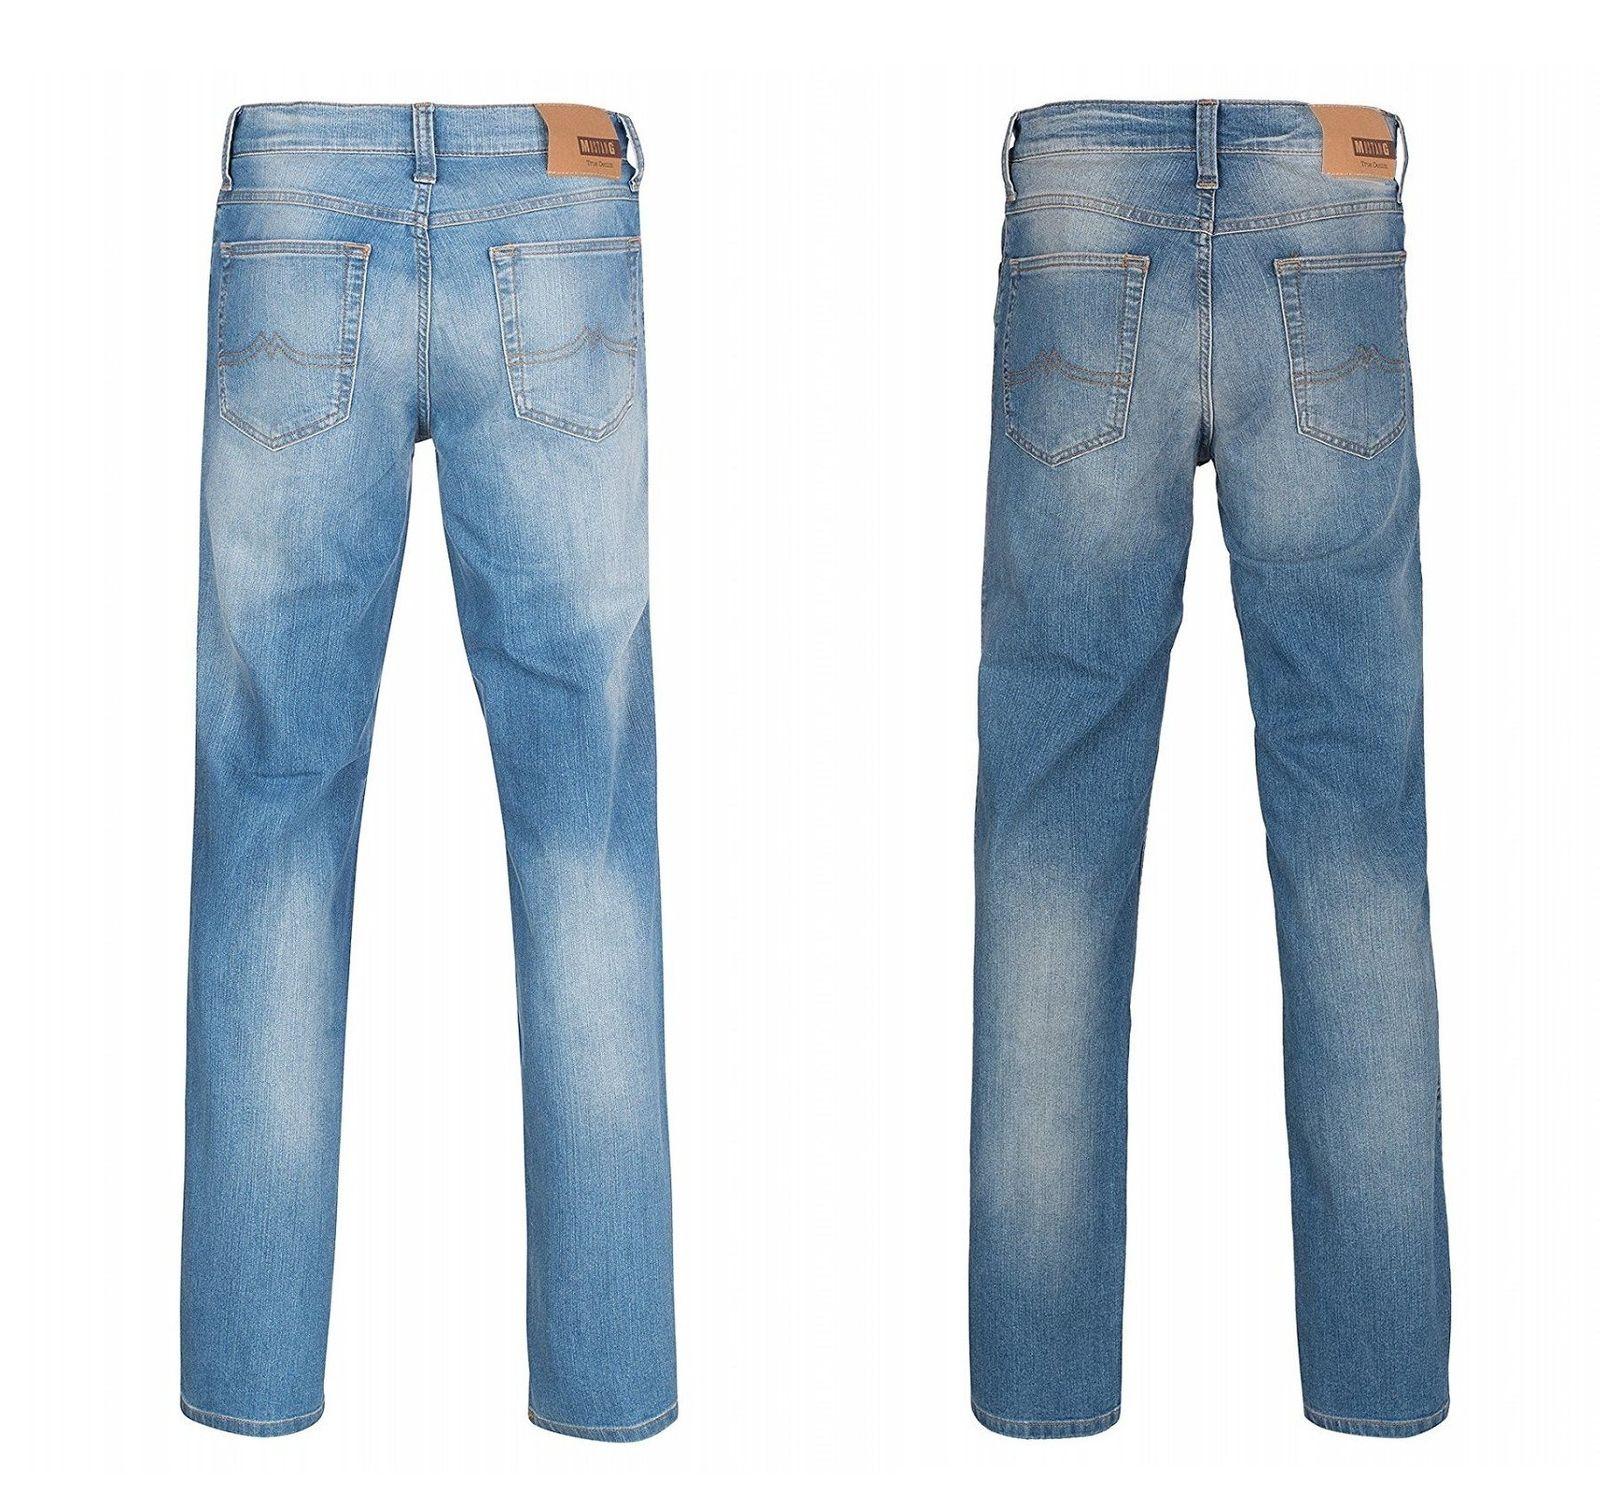 Mustang Oklahoma Straight Jeans stone washed - Angebot auf eBay